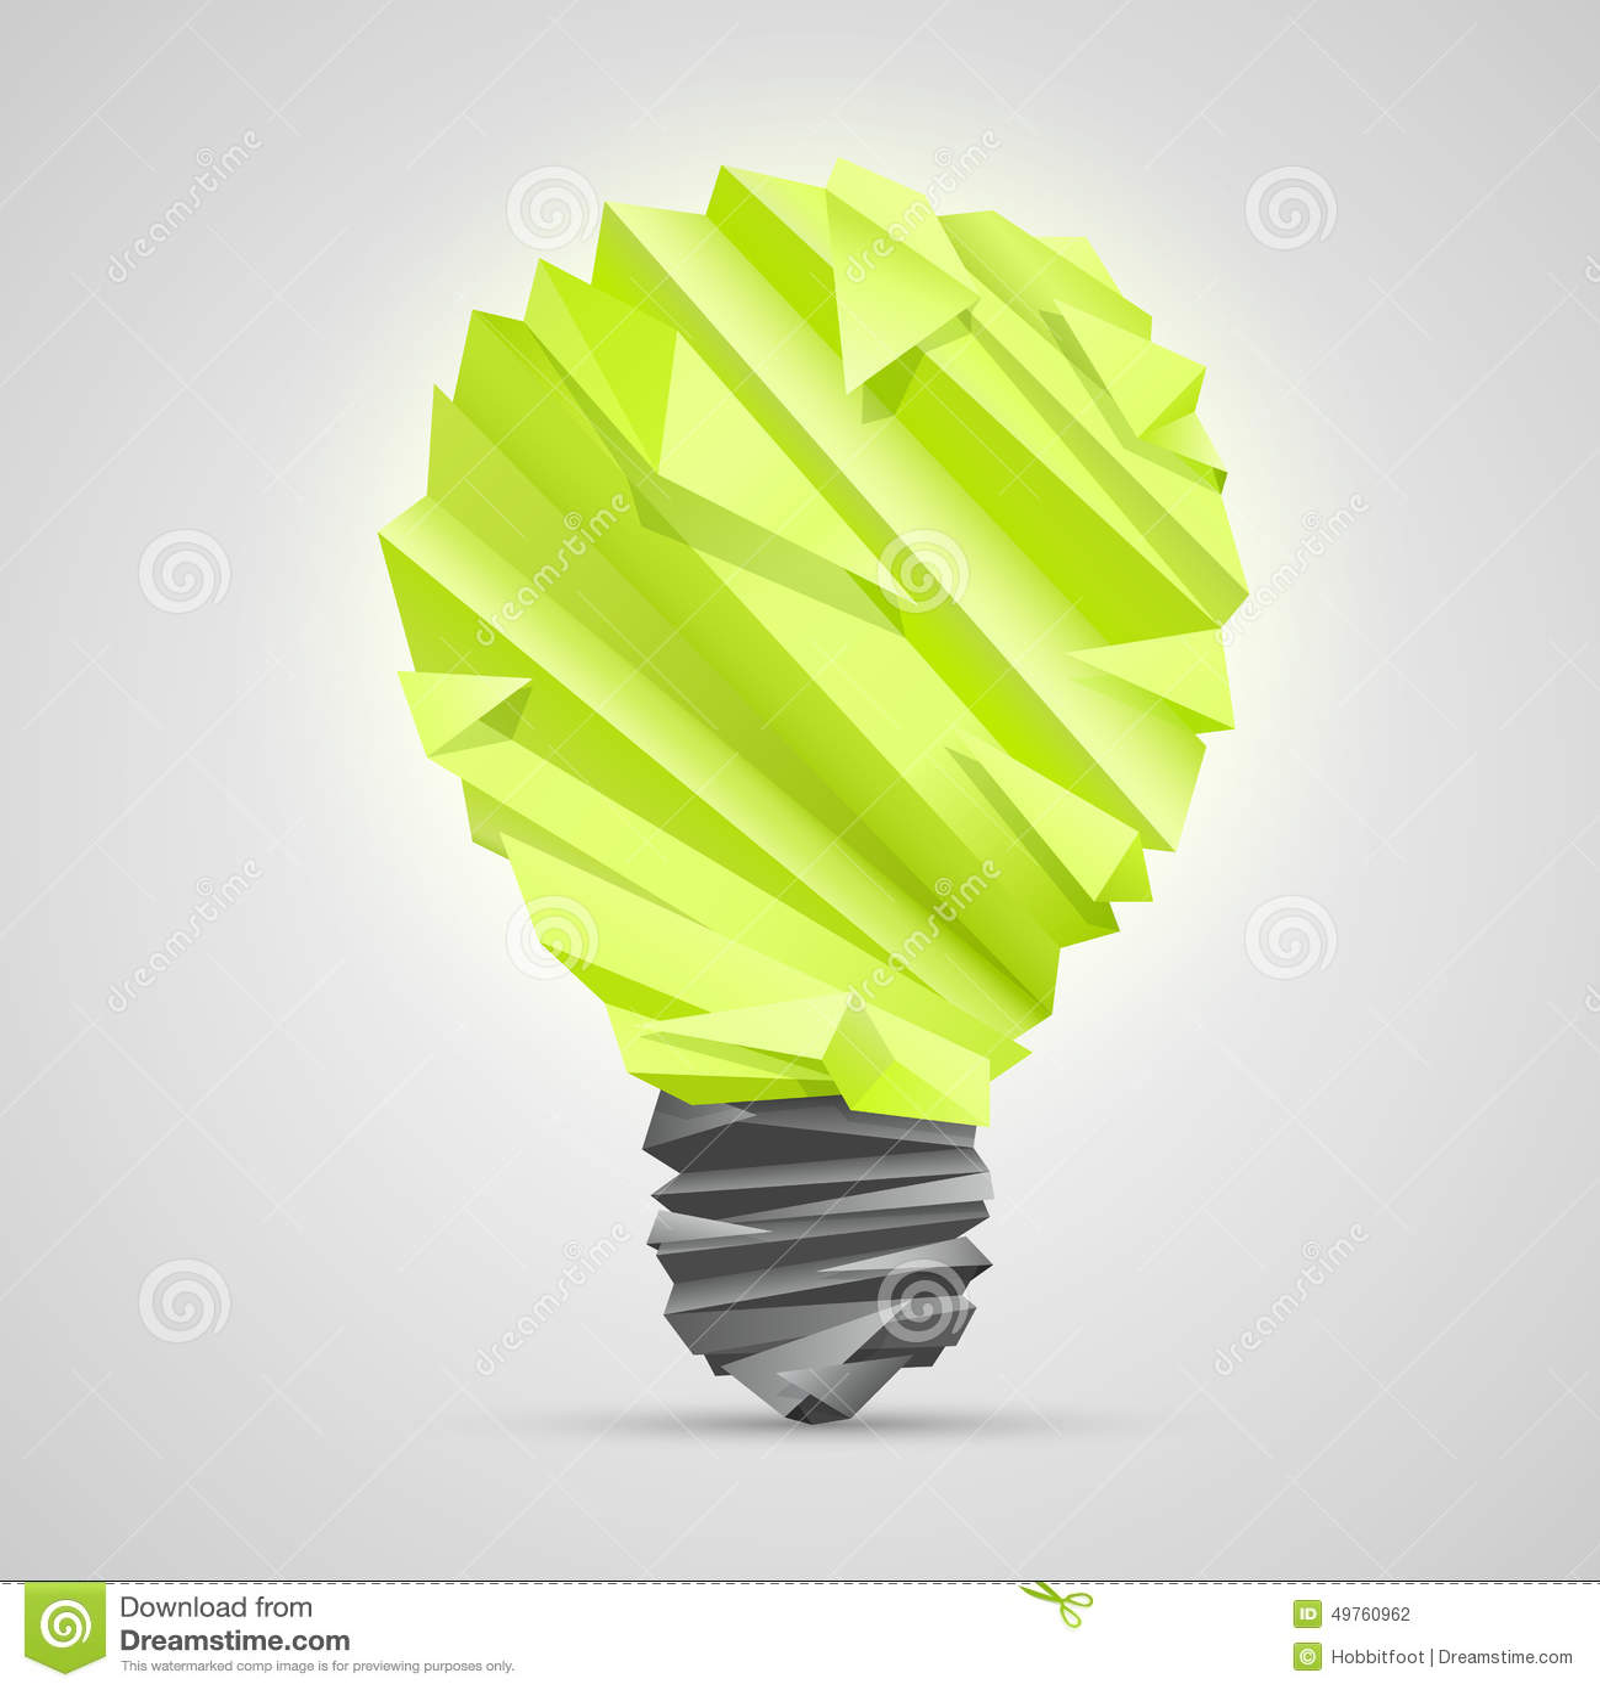 id e cr ative de lampe d 39 origami illustration de vecteur image 49760962. Black Bedroom Furniture Sets. Home Design Ideas